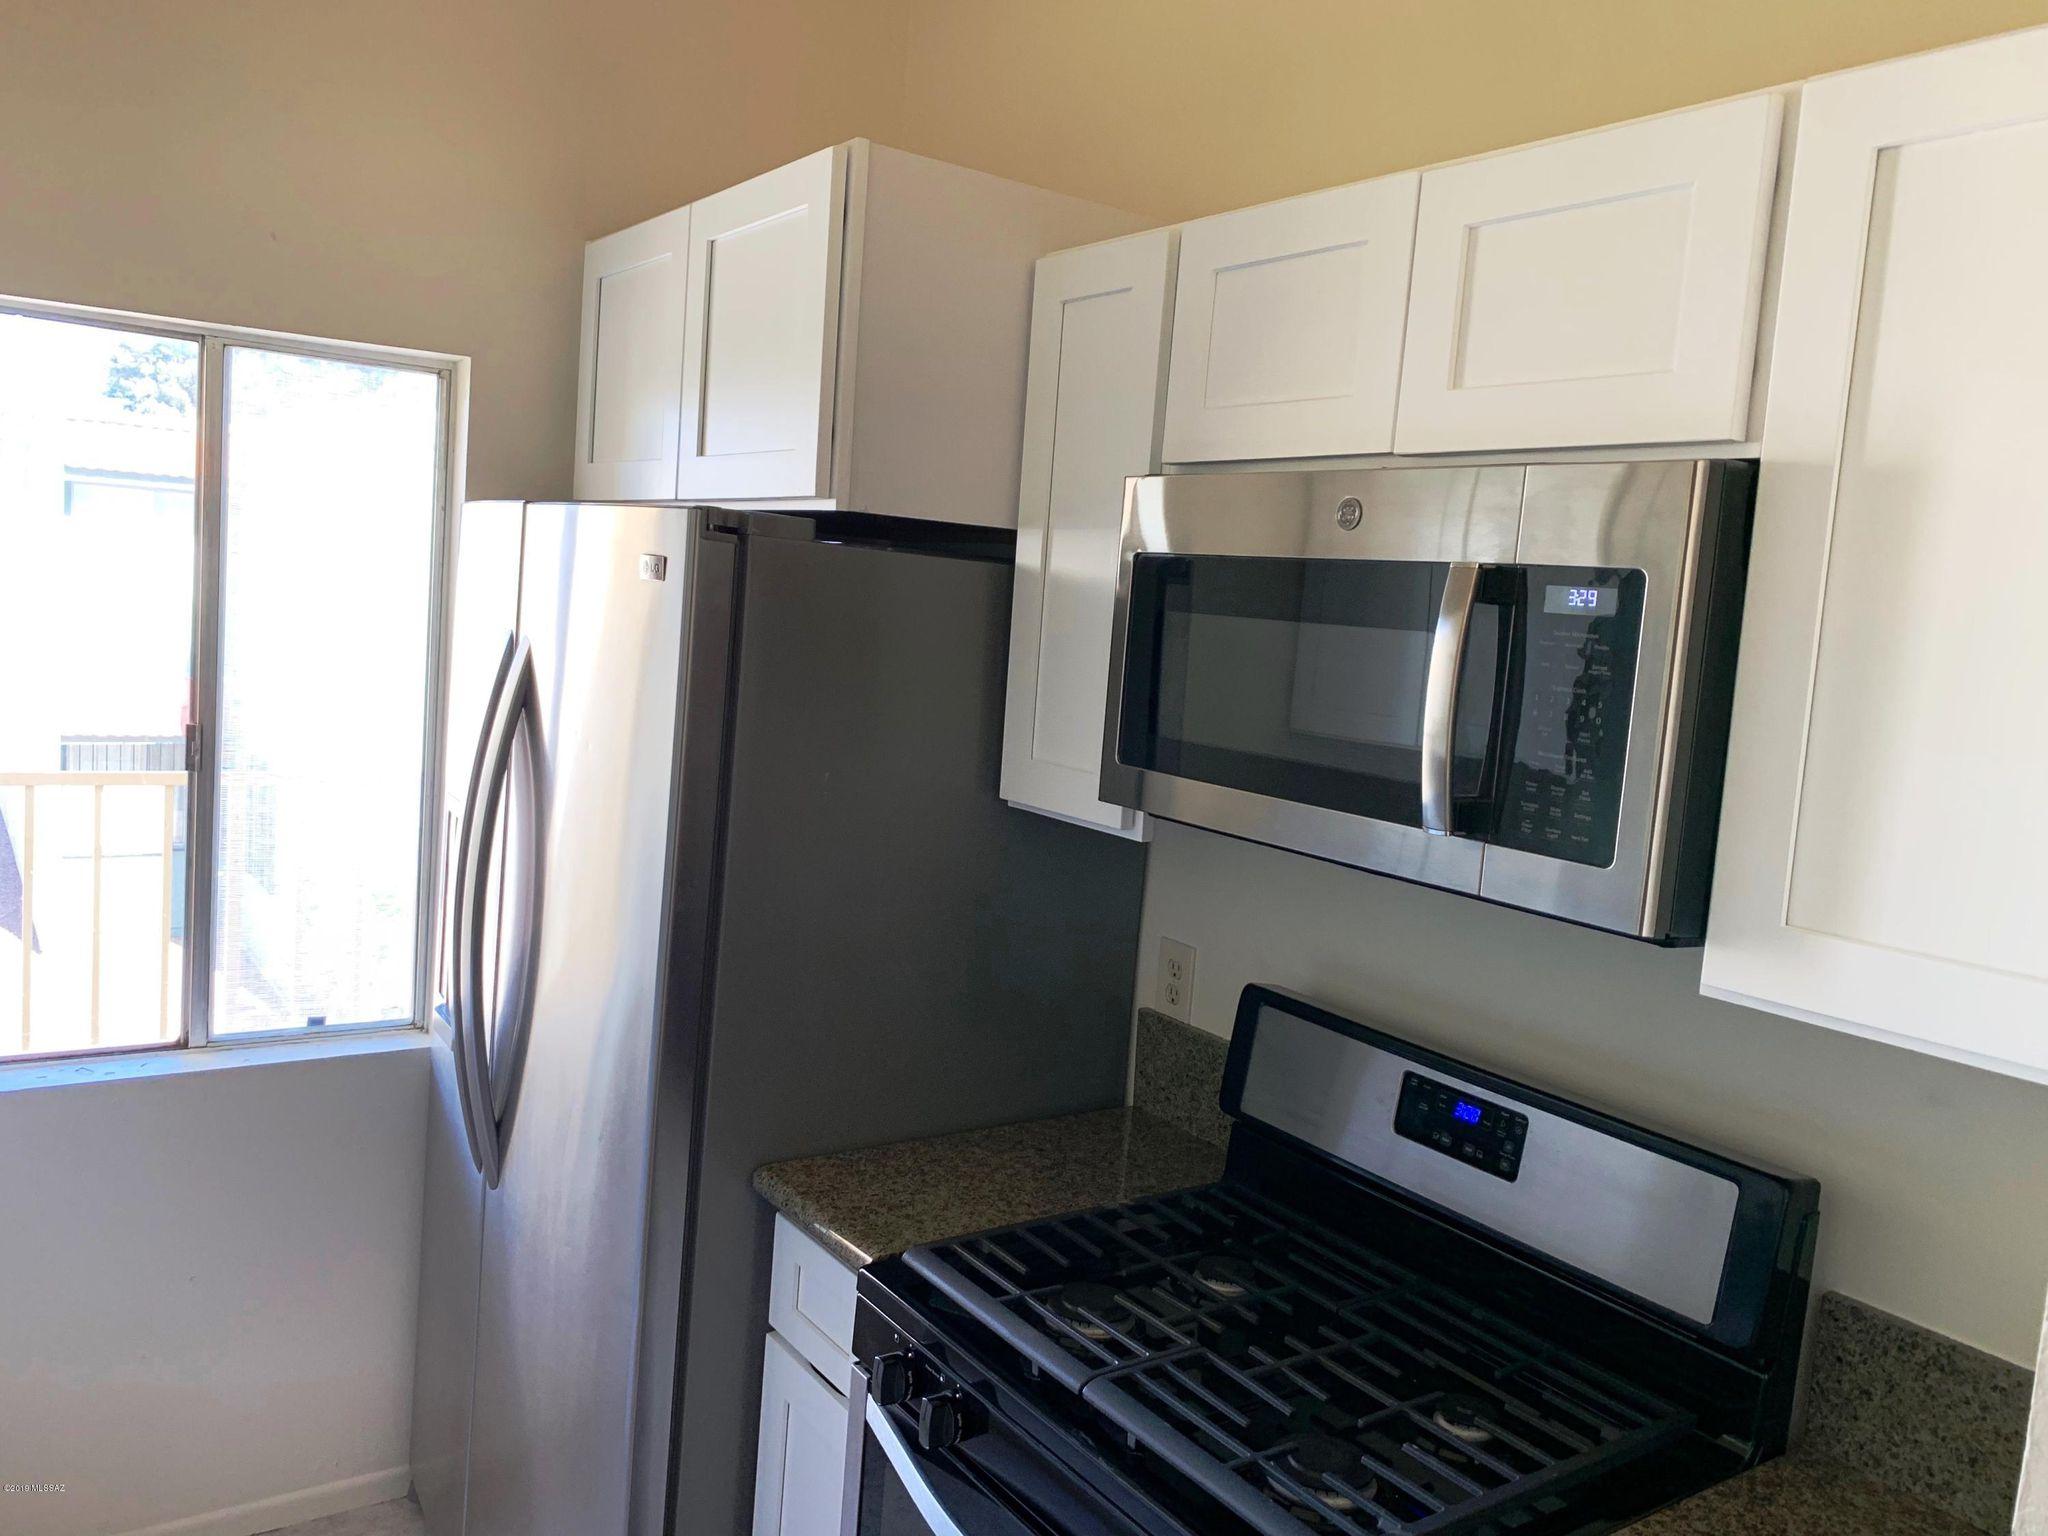 808 S Langley Ave 205 Tucson Az 85710 2 Bed 2 Bath Single